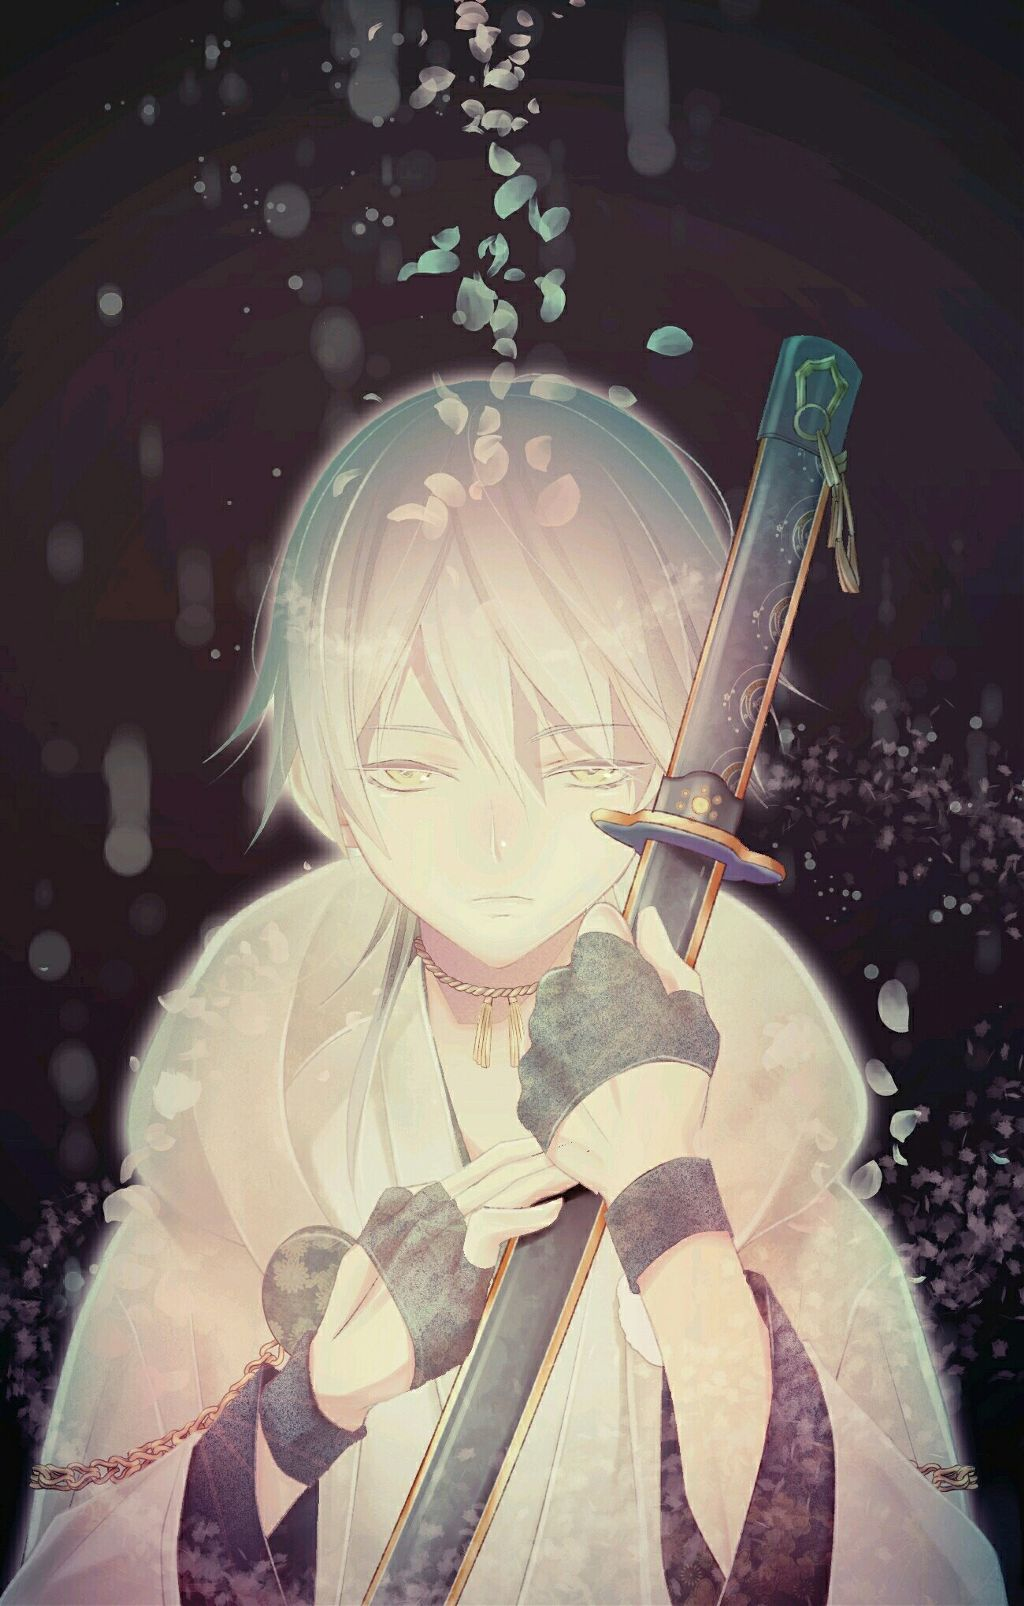 Freetoedit art anime beautiful boy fantasy flower nosmiles